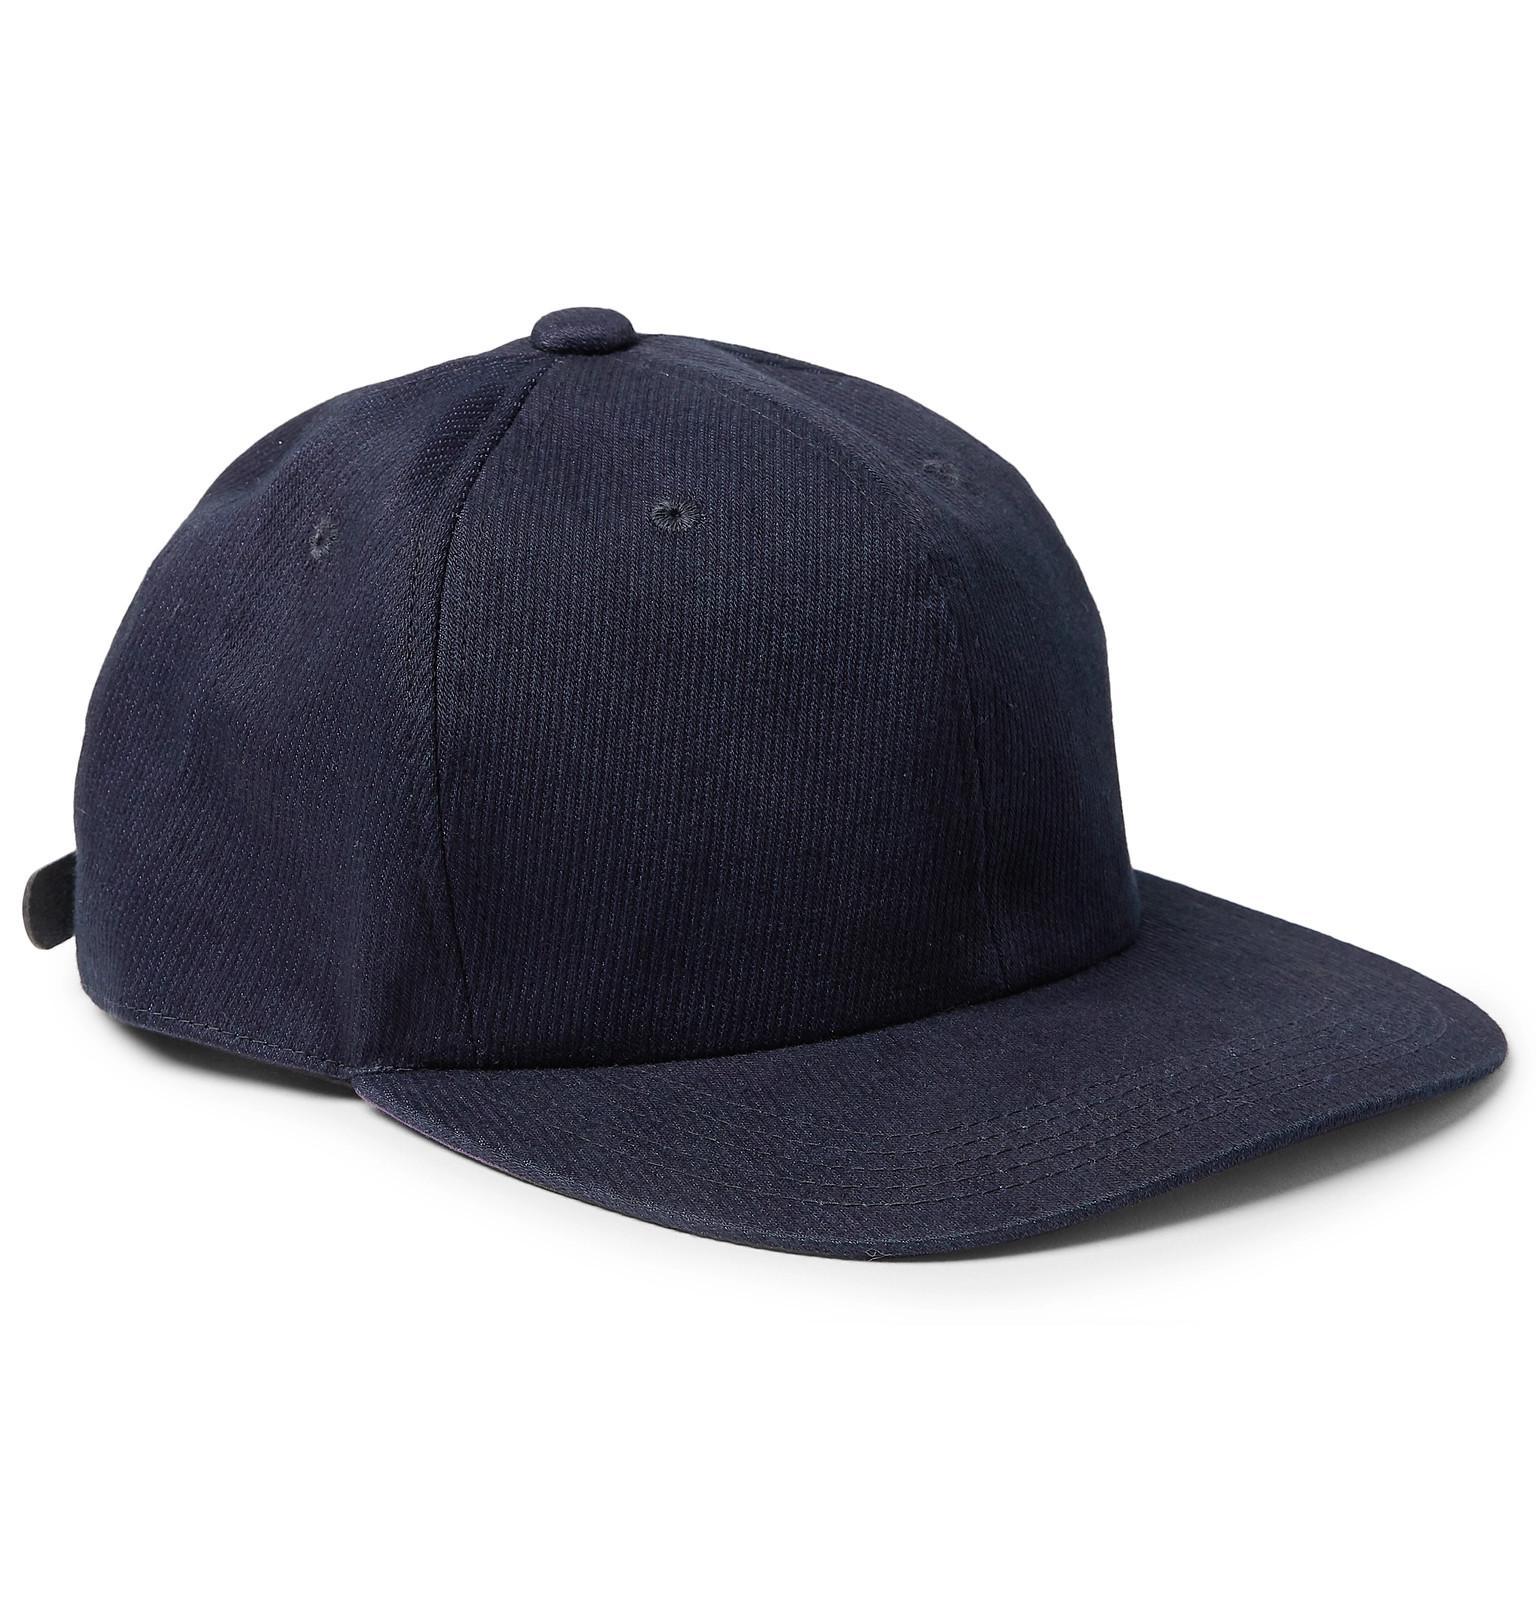 Blue Blue Japan. Men s Blue Cotton-blend Twill Baseball Cap.  105 From MR  PORTER ... 0f1549c59f7